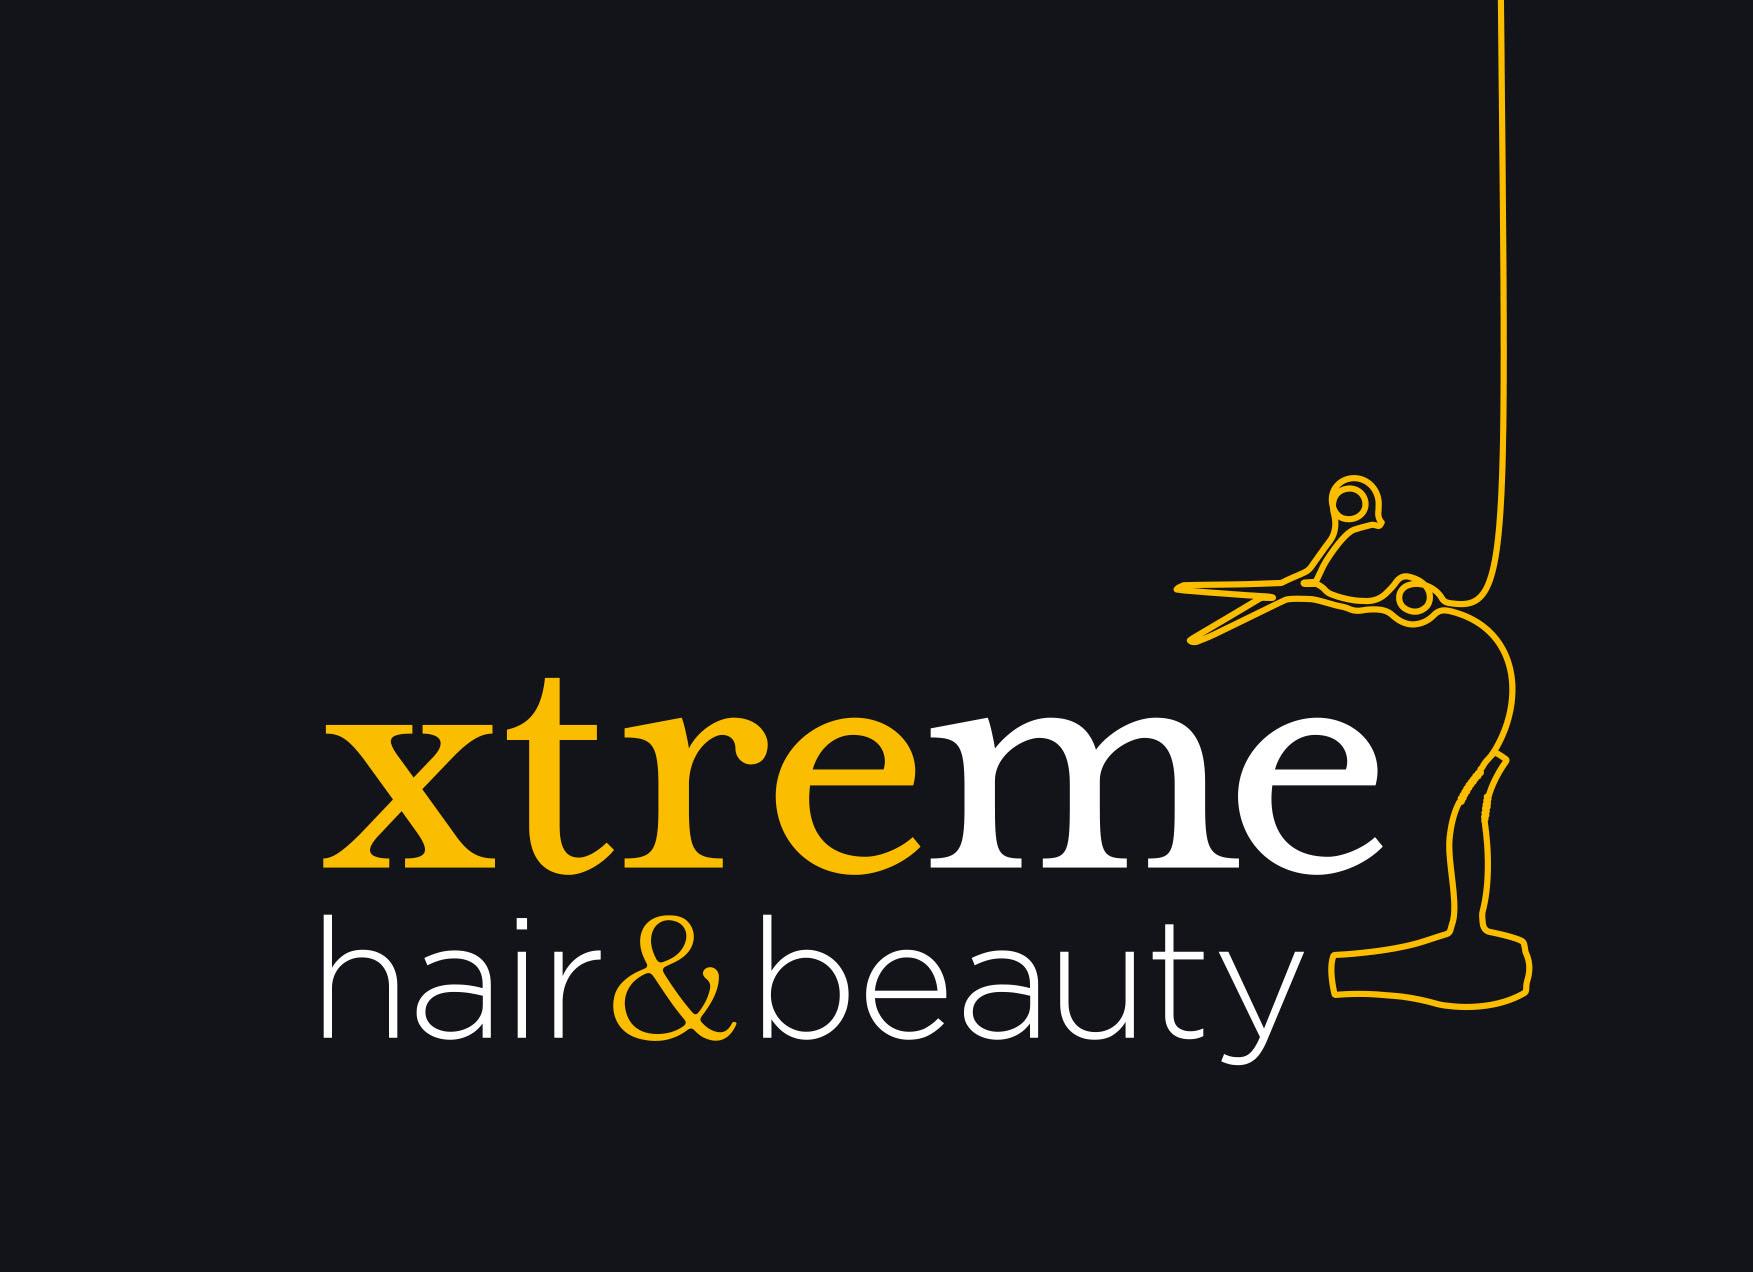 Xtreme Hair & Beauty logo